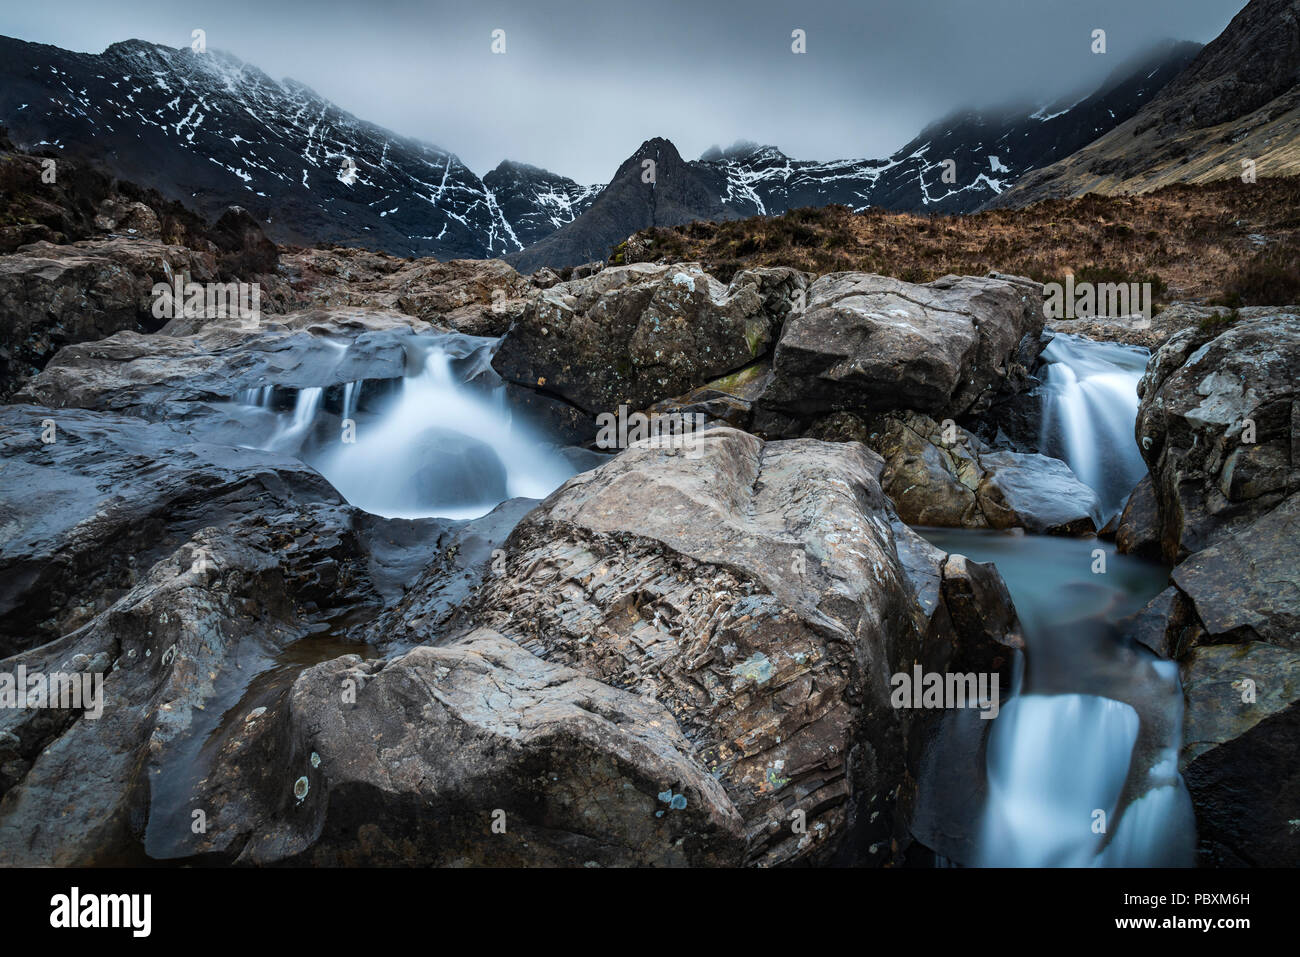 Fairy Pools waterfall, Isle of Skye, Scotland, UK, Europe - Stock Image